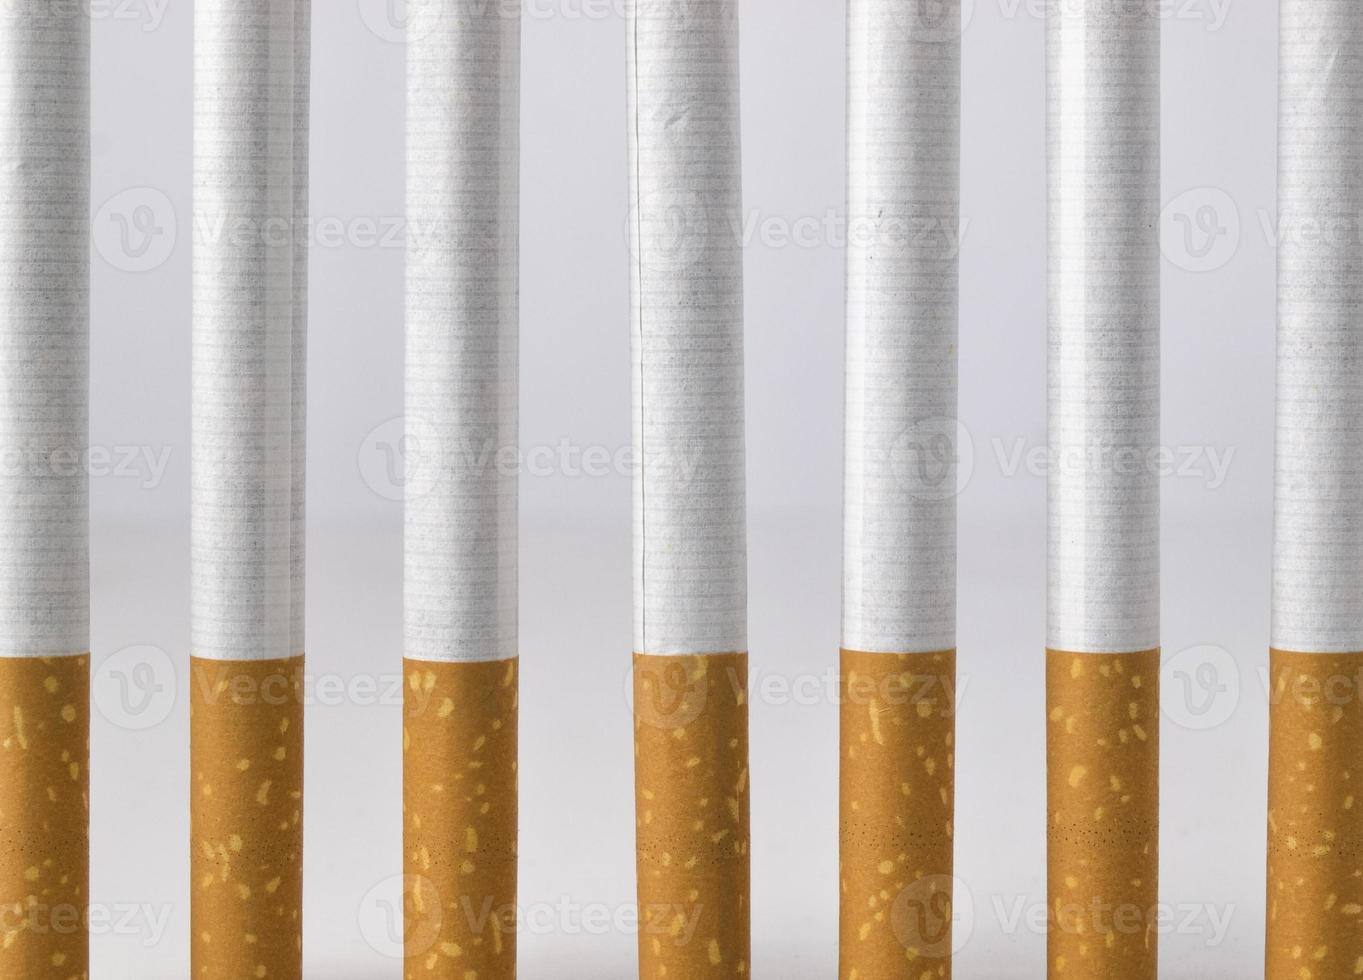 Smoking is a prison photo